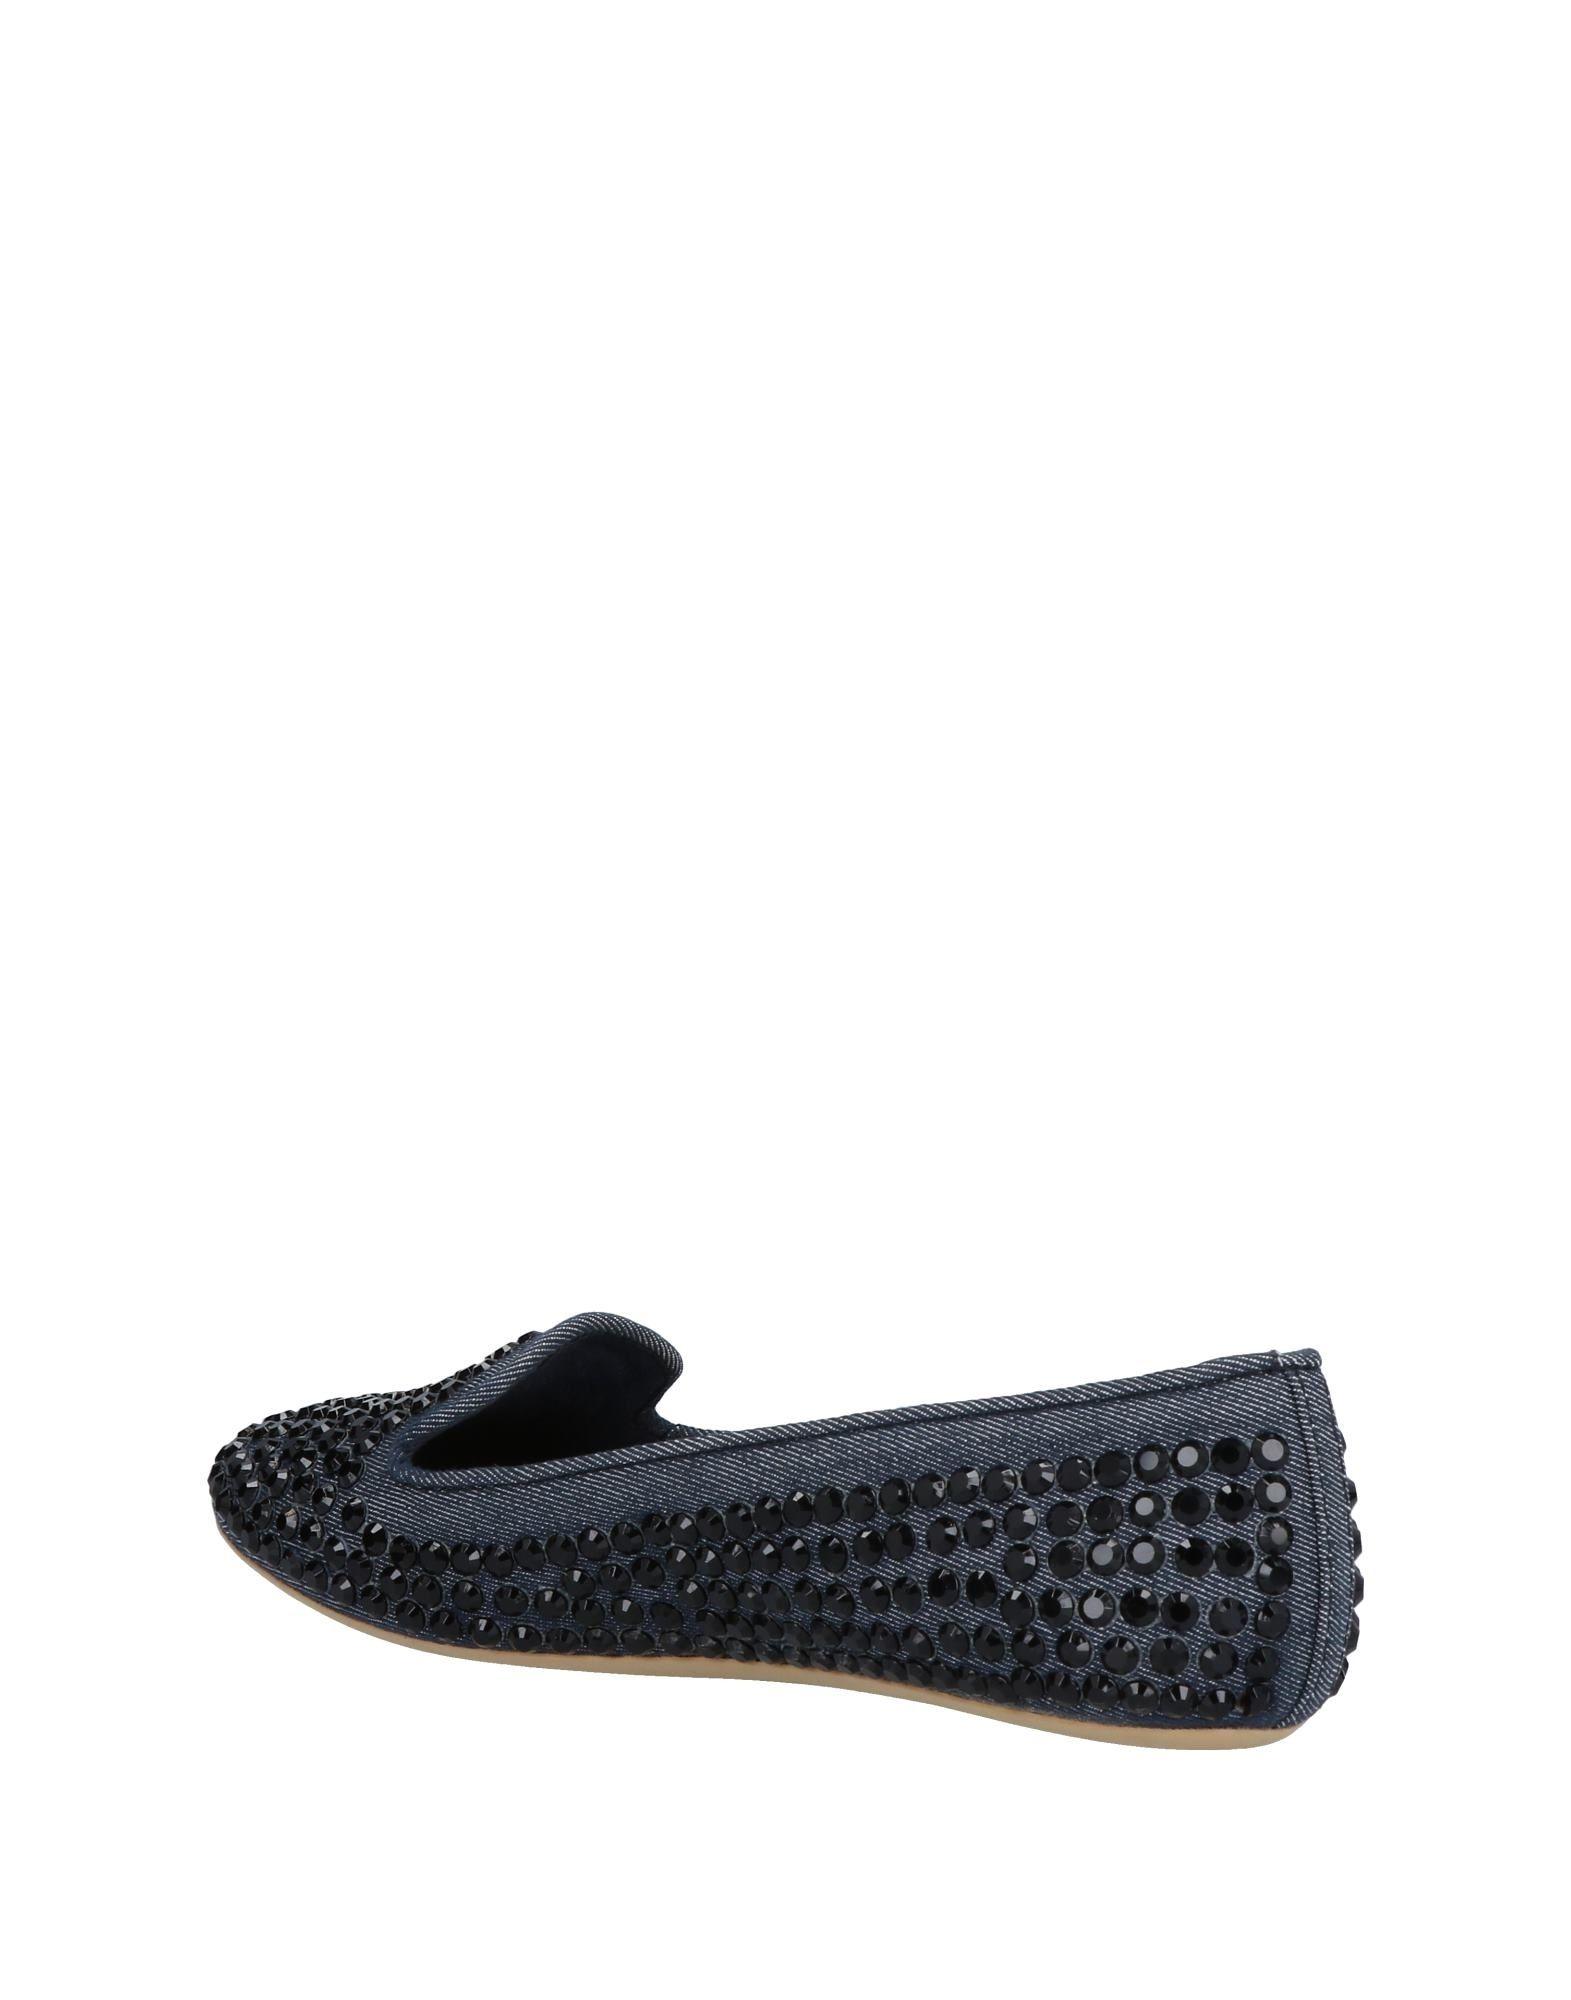 Gut um Mokassins billige Schuhe zu tragenAtos Lombardini Mokassins um Damen  11491784FU 4e8635